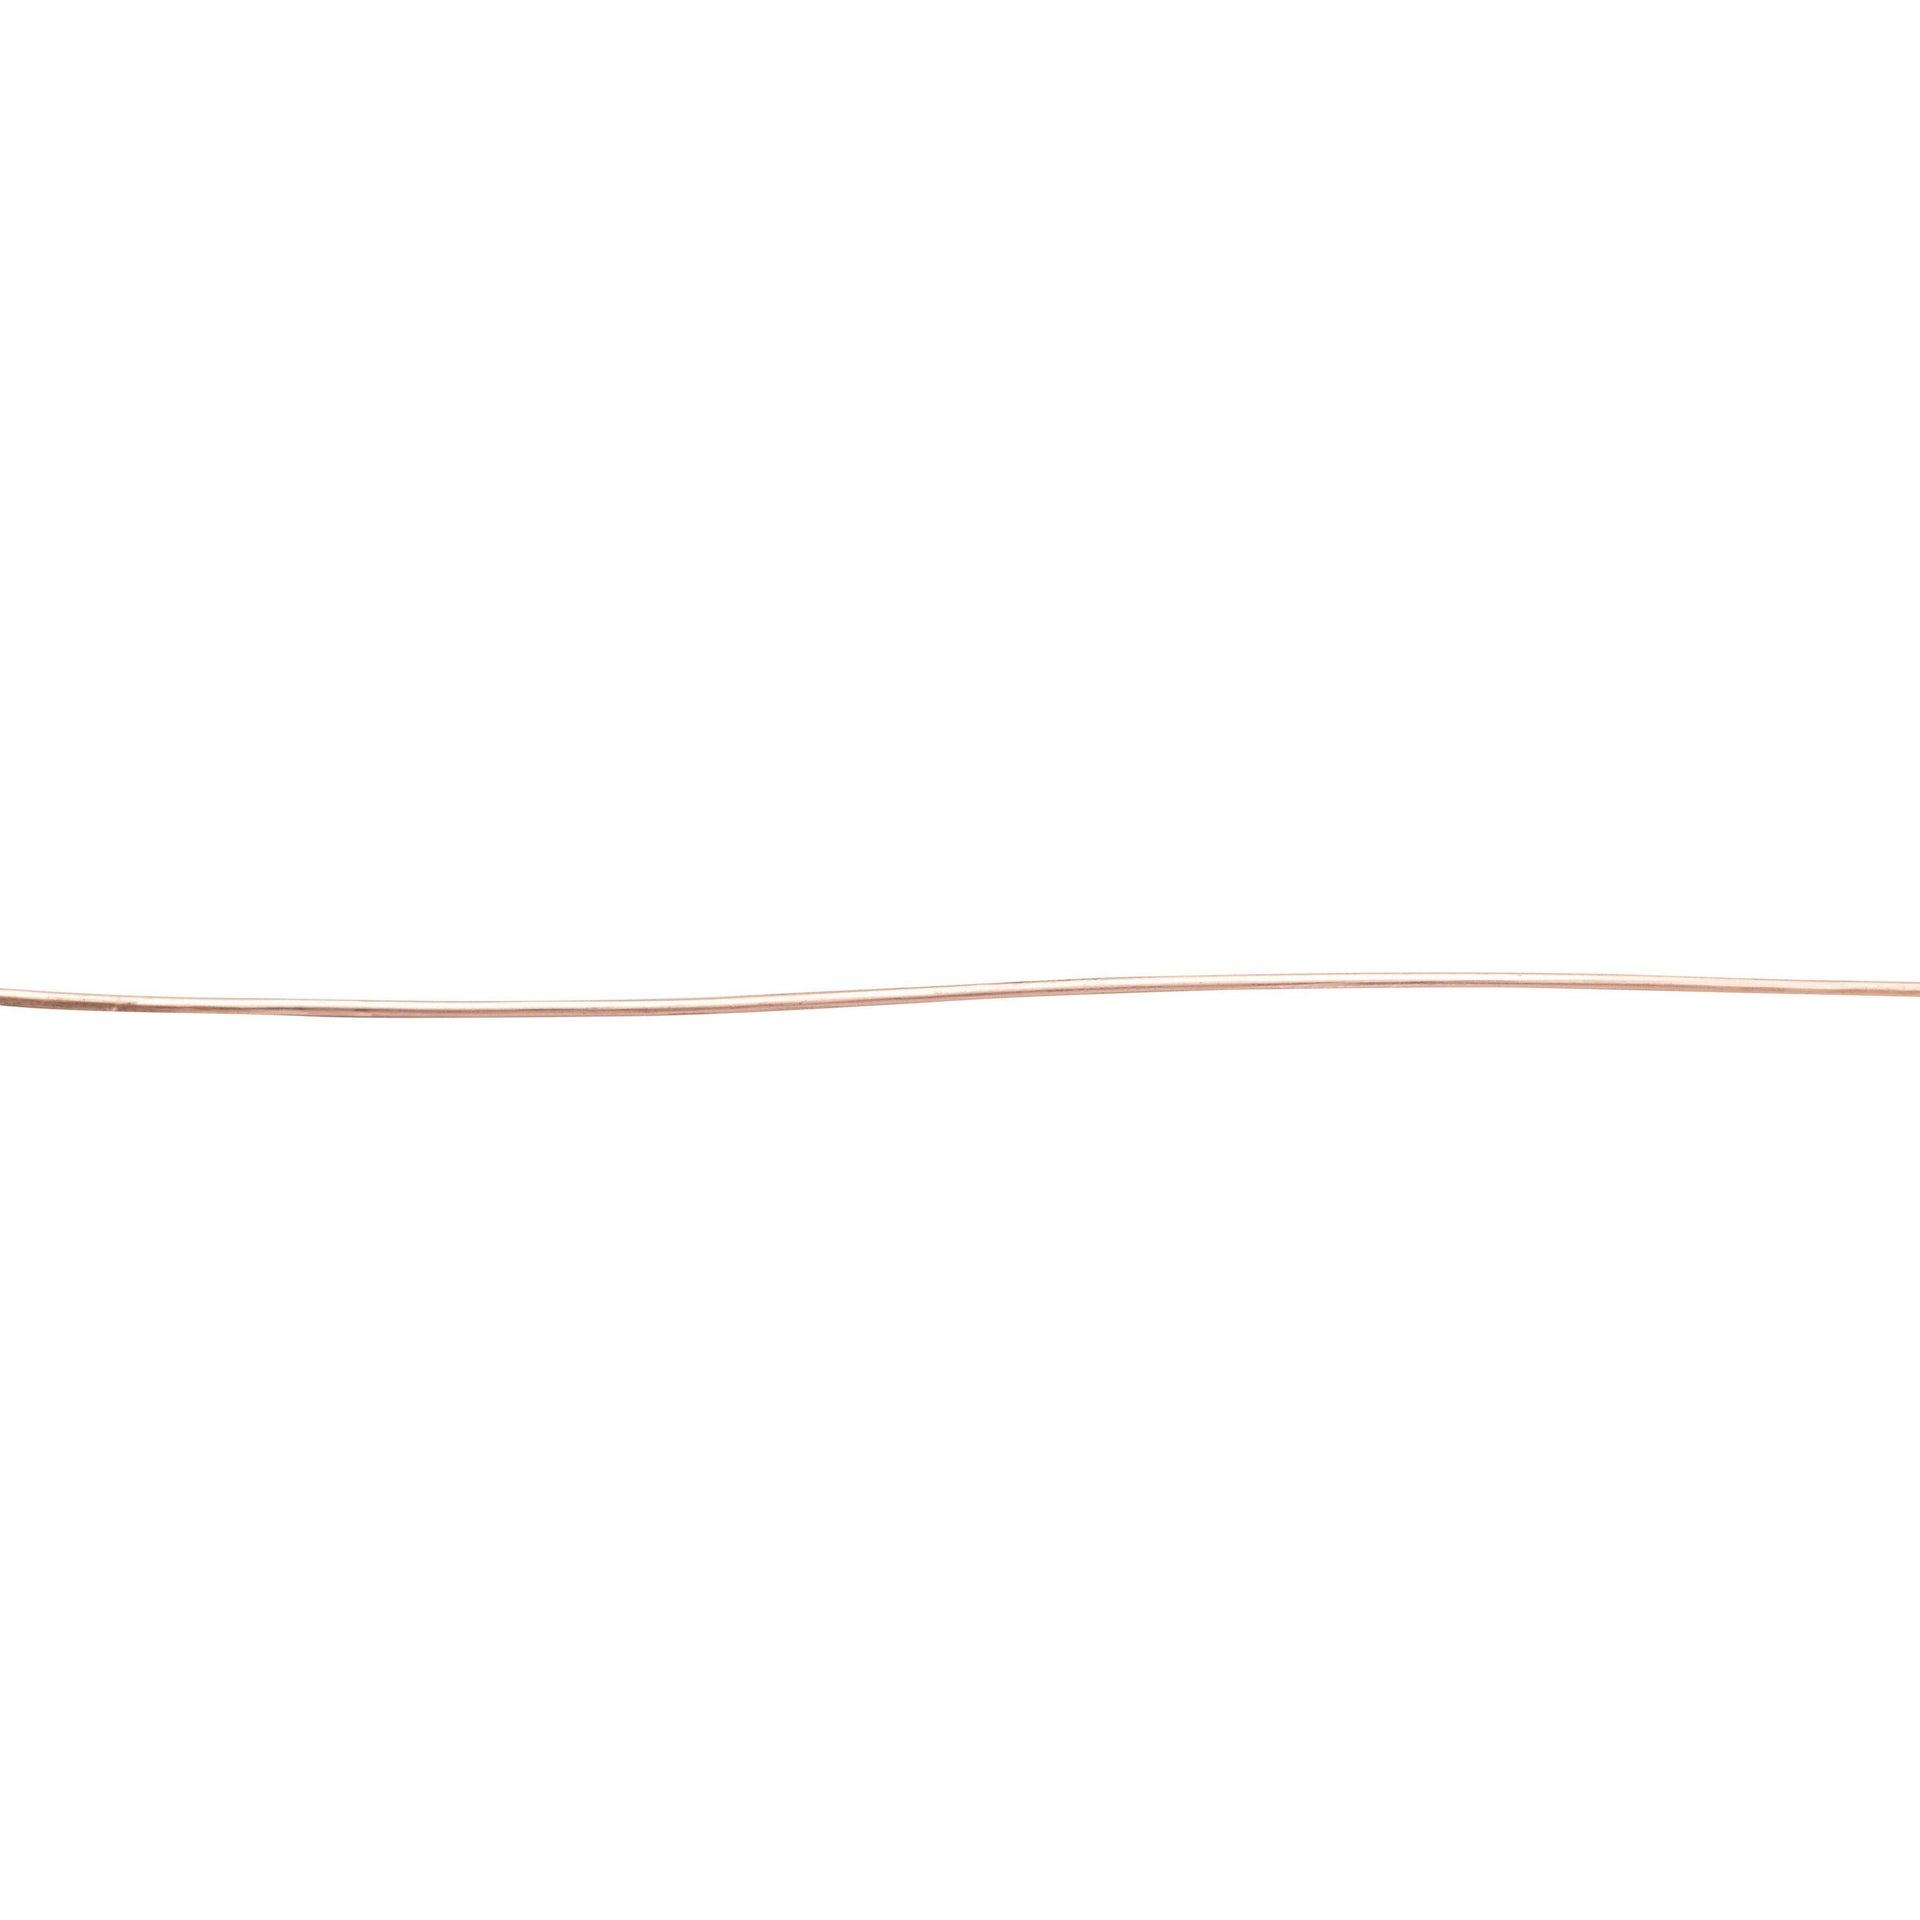 Filo in rame STANDERS Ø 0.8 mm x L 25 m - 2